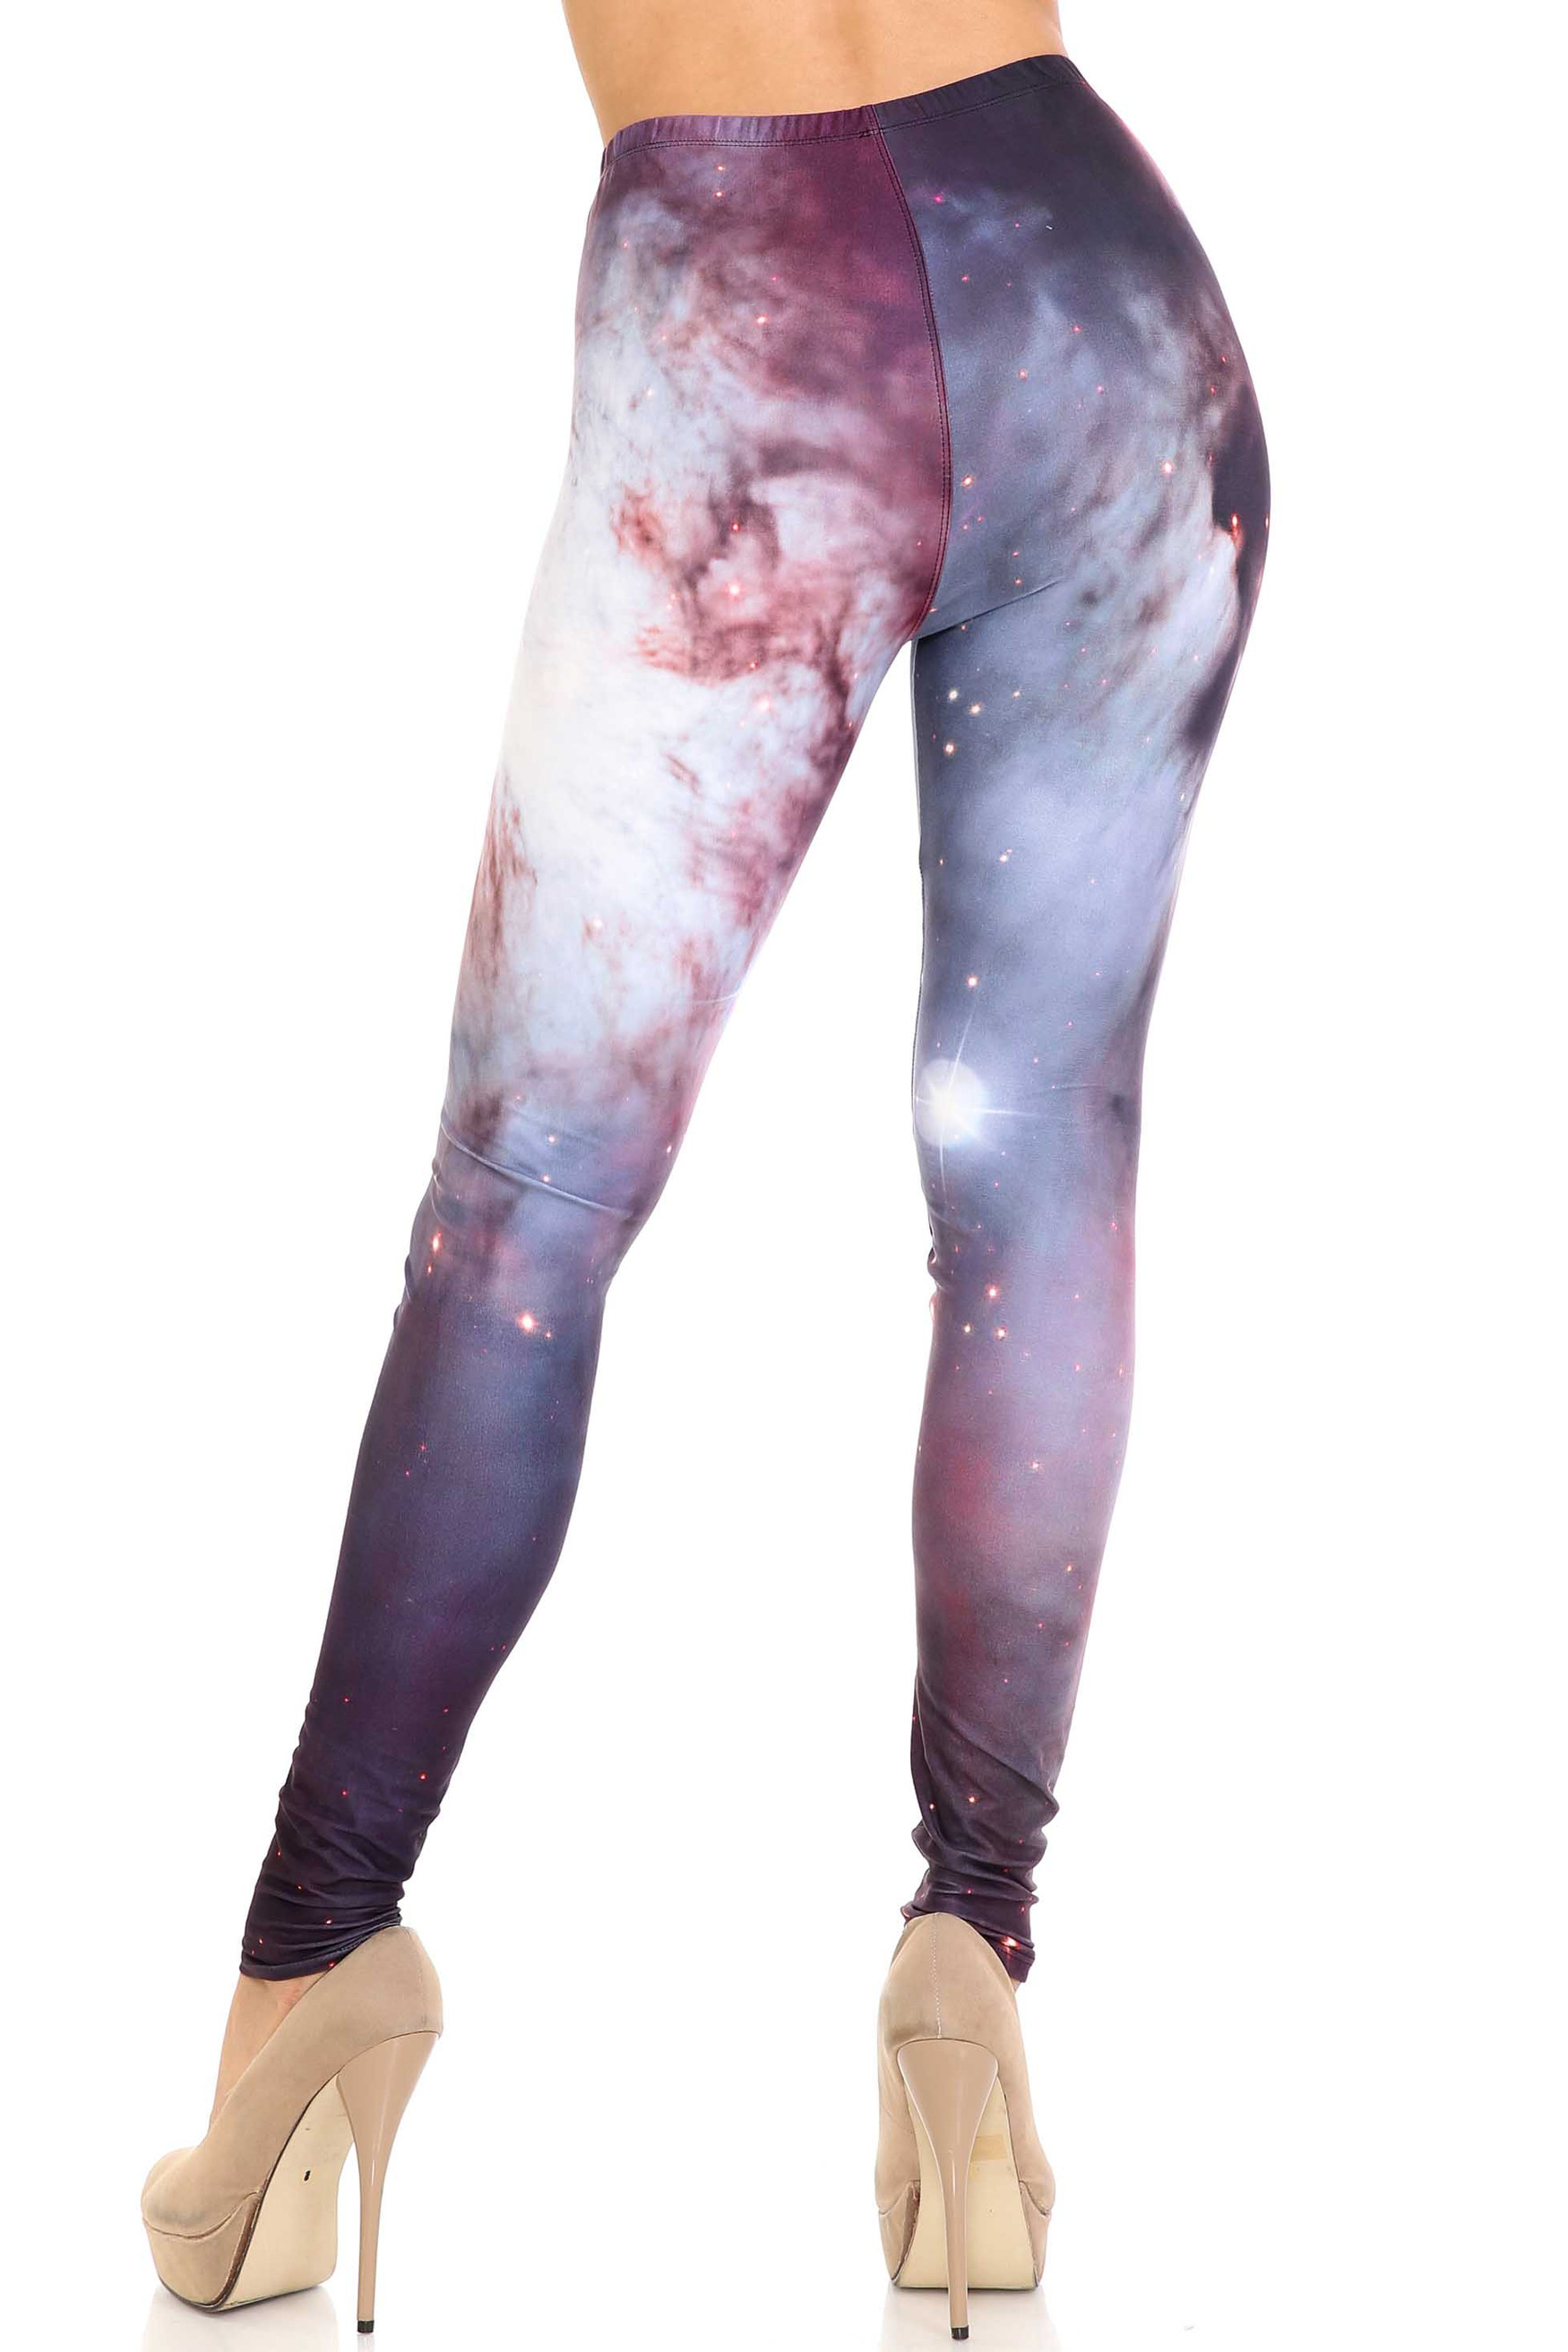 Creamy Soft Black Galaxy Plus Size Leggings - USA Fashion™